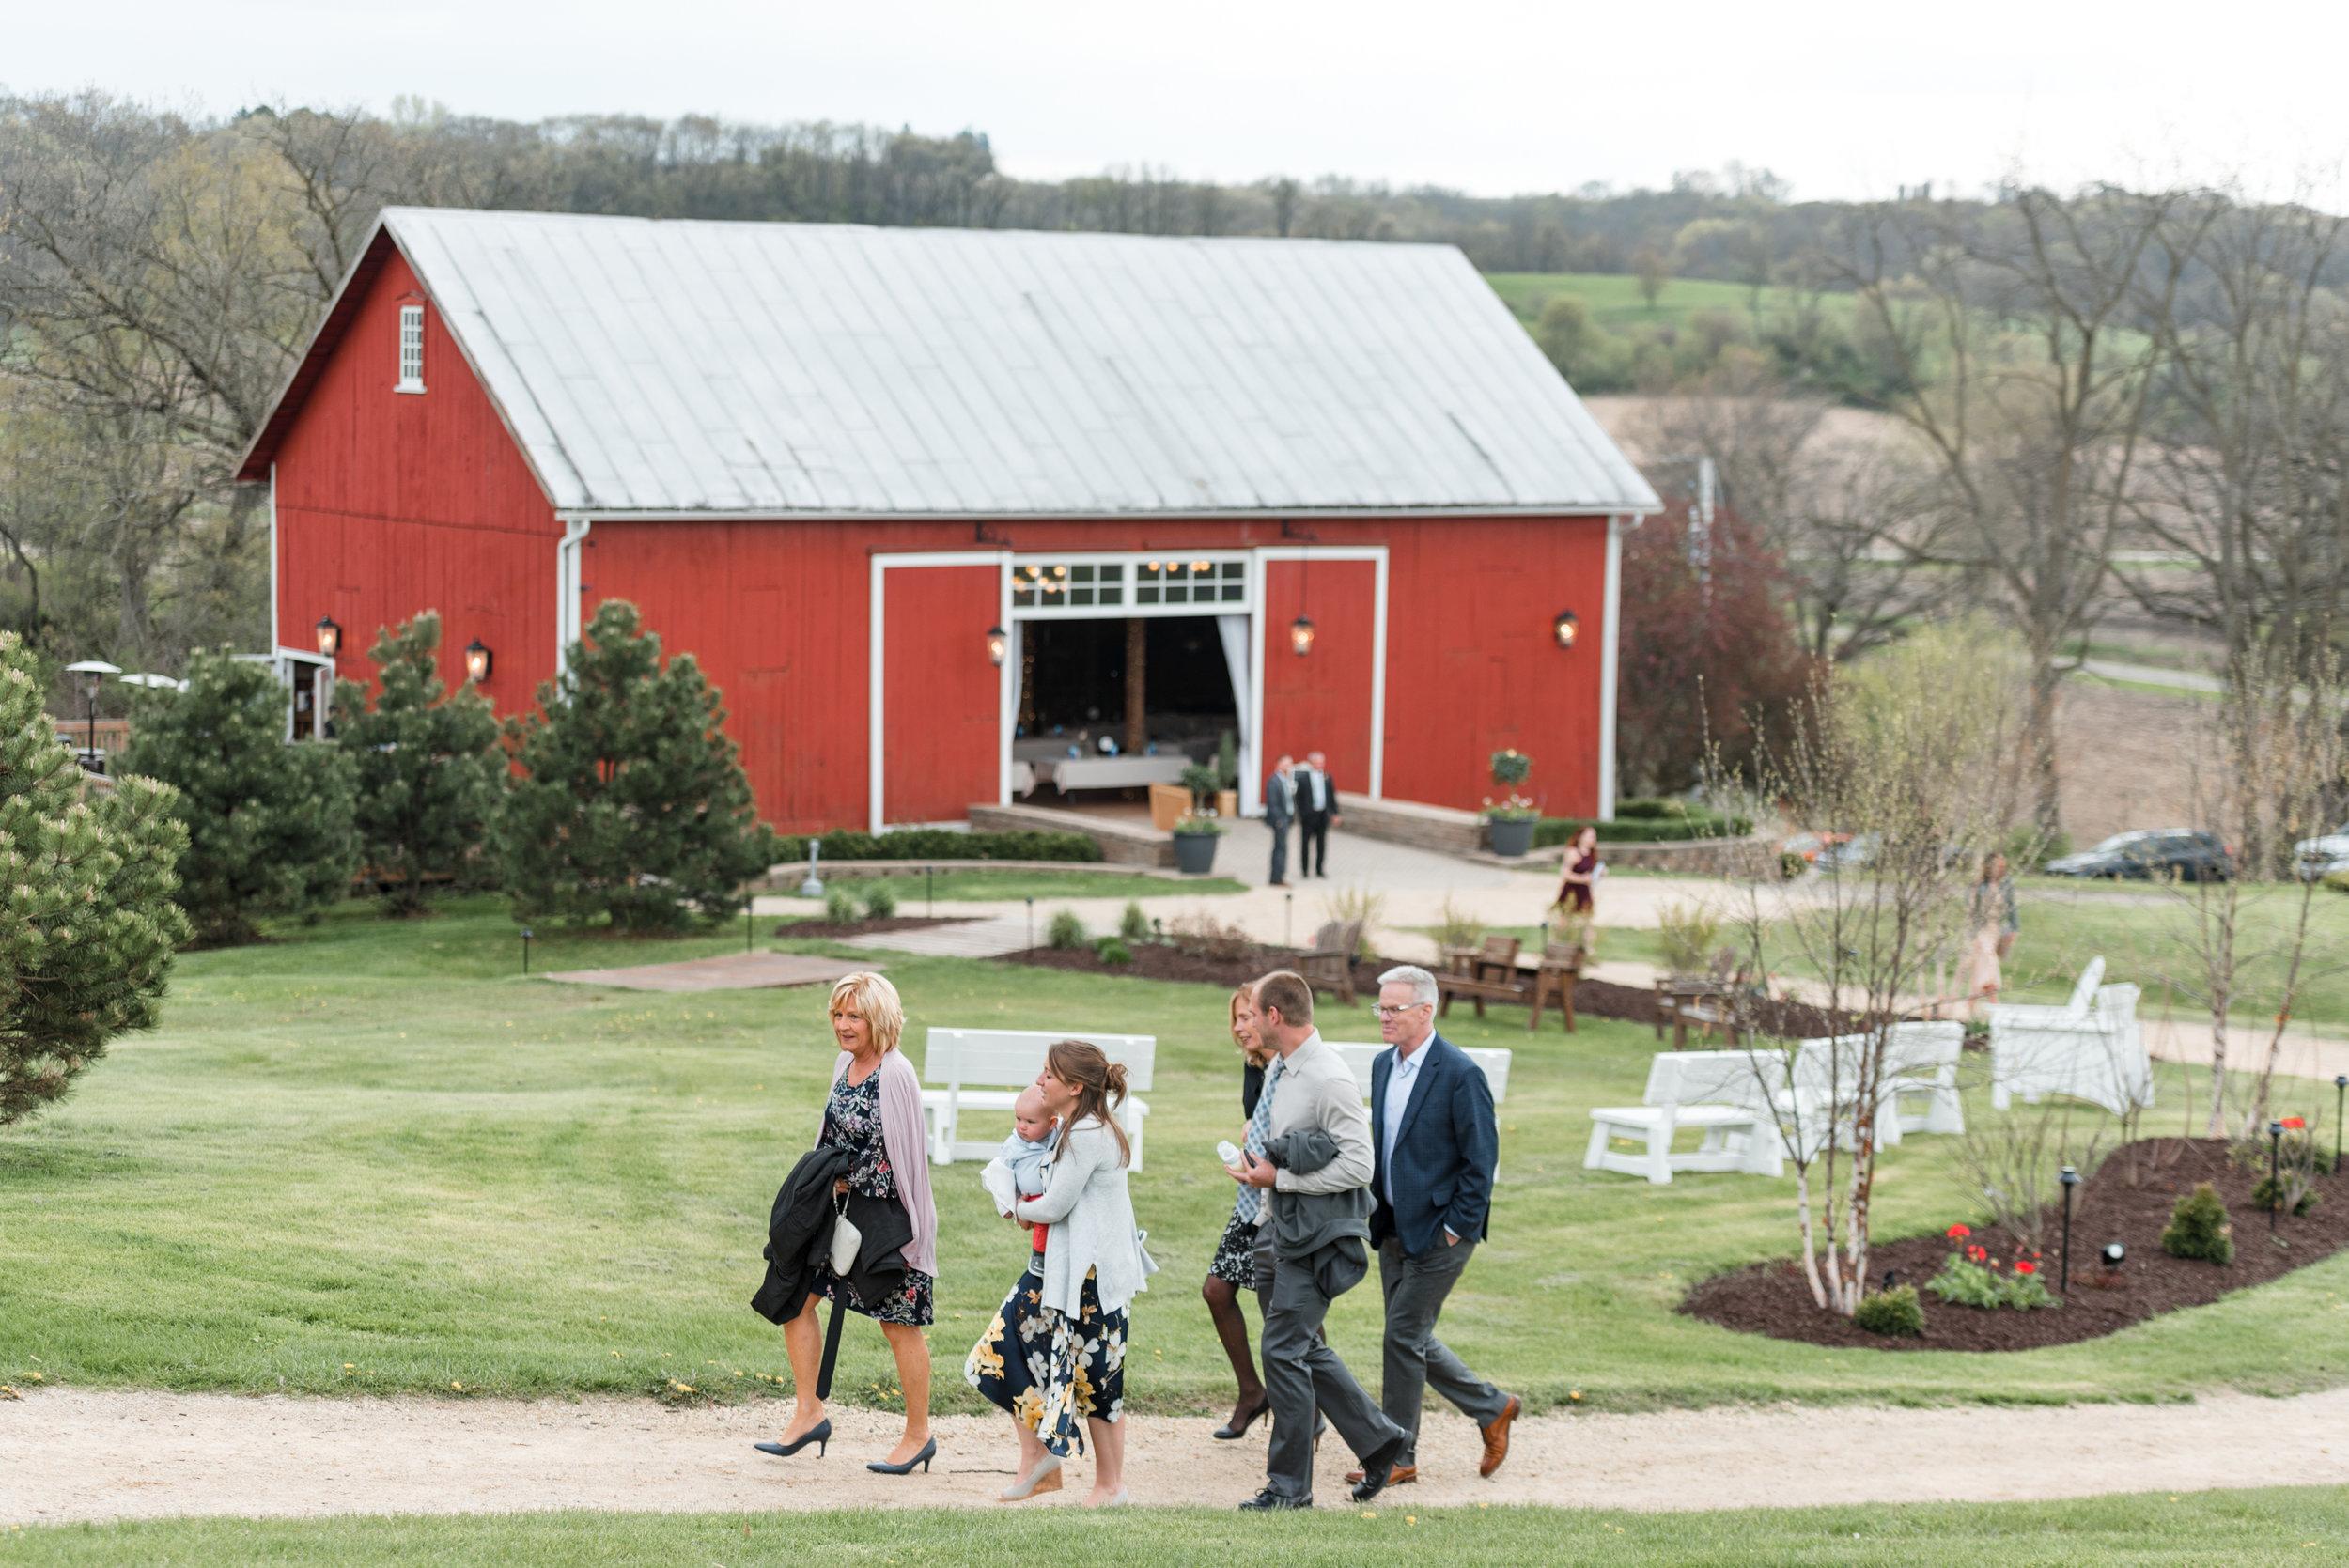 Mt_Horeb_Bridl_Barn_wedding_Photographer_Gavyn_Taylor_Photo_Dani_Eric (28 of 50).jpg